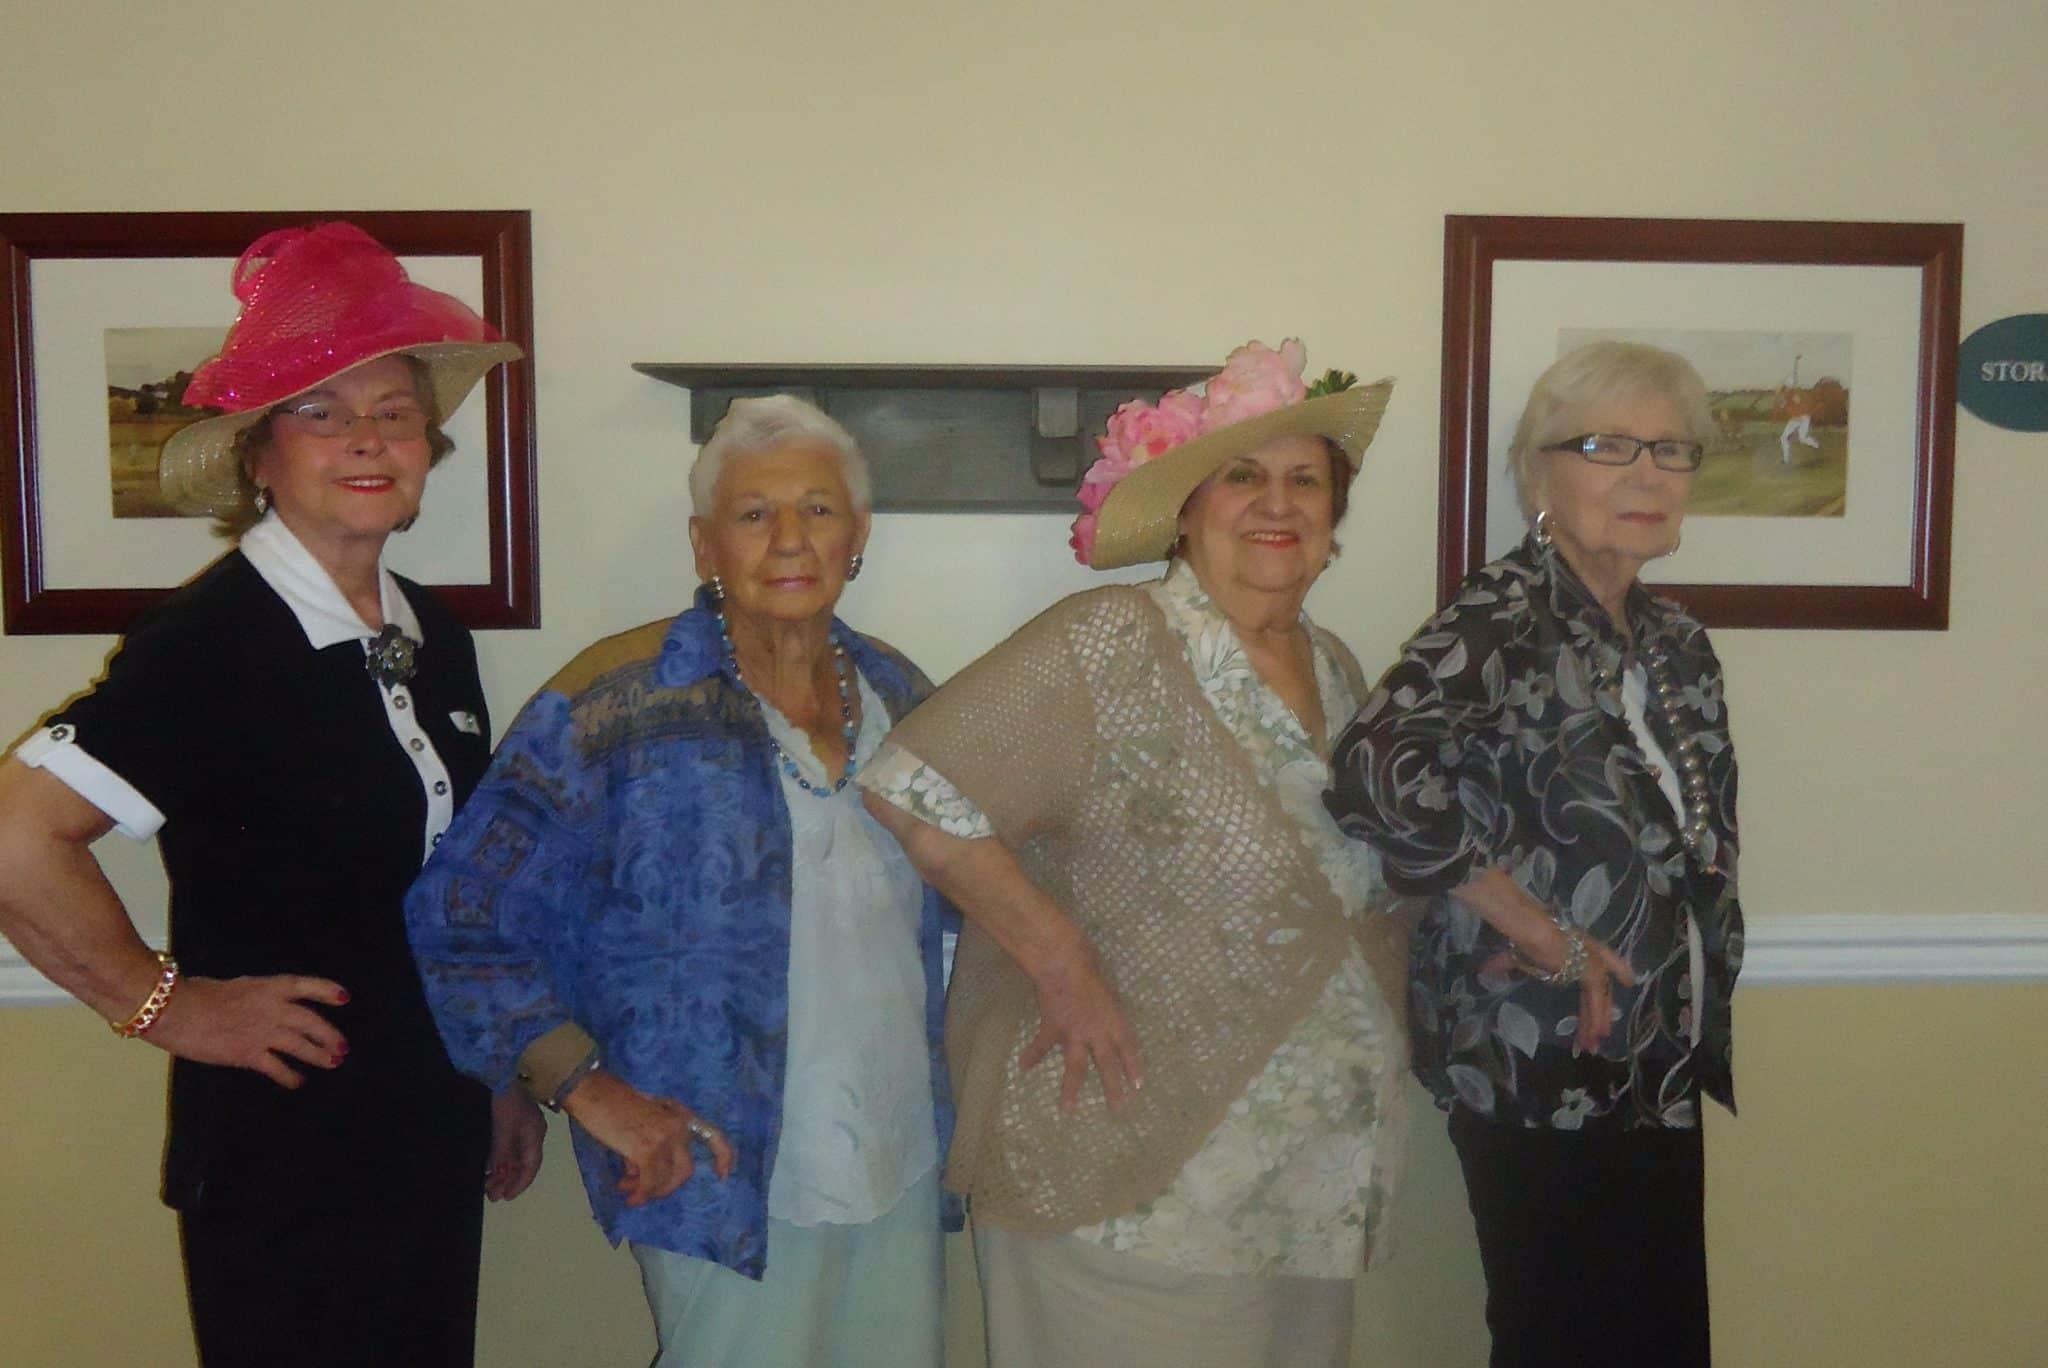 Get a Gander at These Gorgeous Grandmas